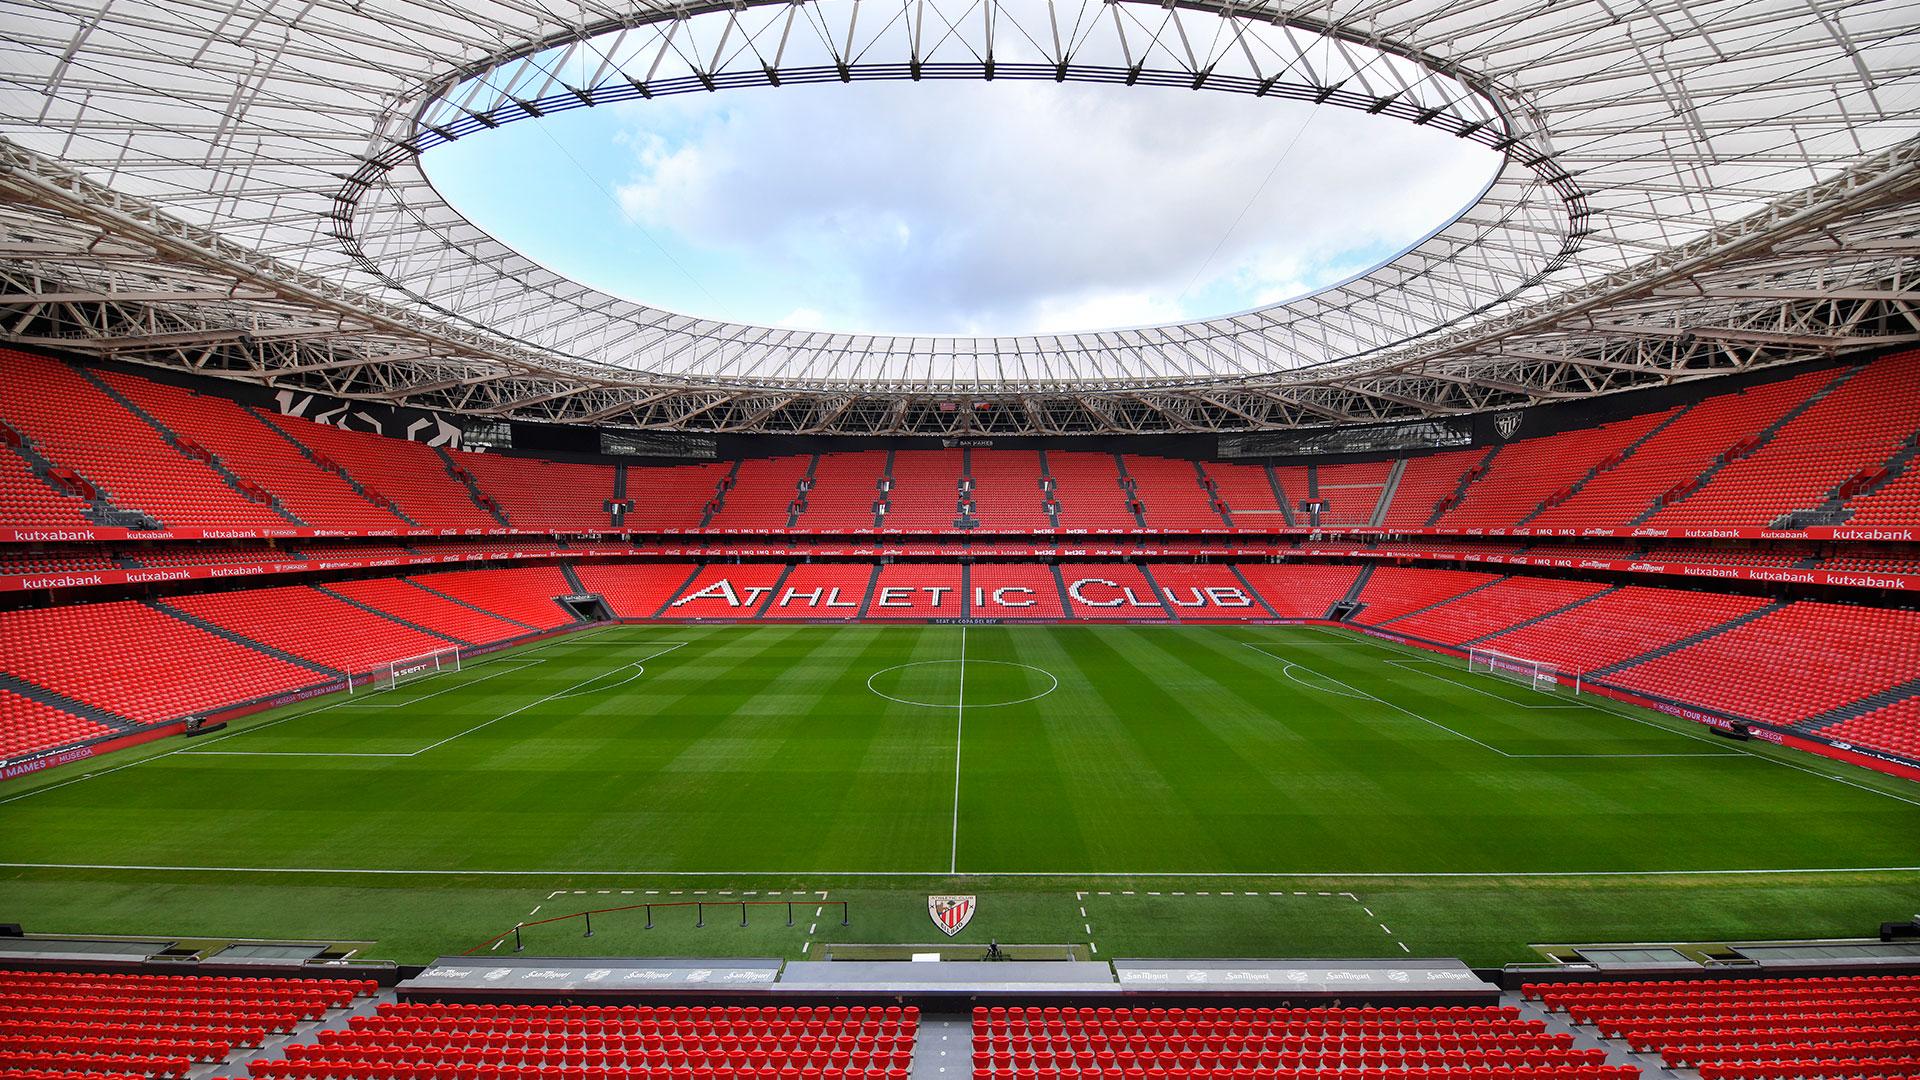 Estadio de San Mamés. Virtual background to use on Zoom, Microsoft Teams, Skype, Google Meet, WebEx or any other compatible app.